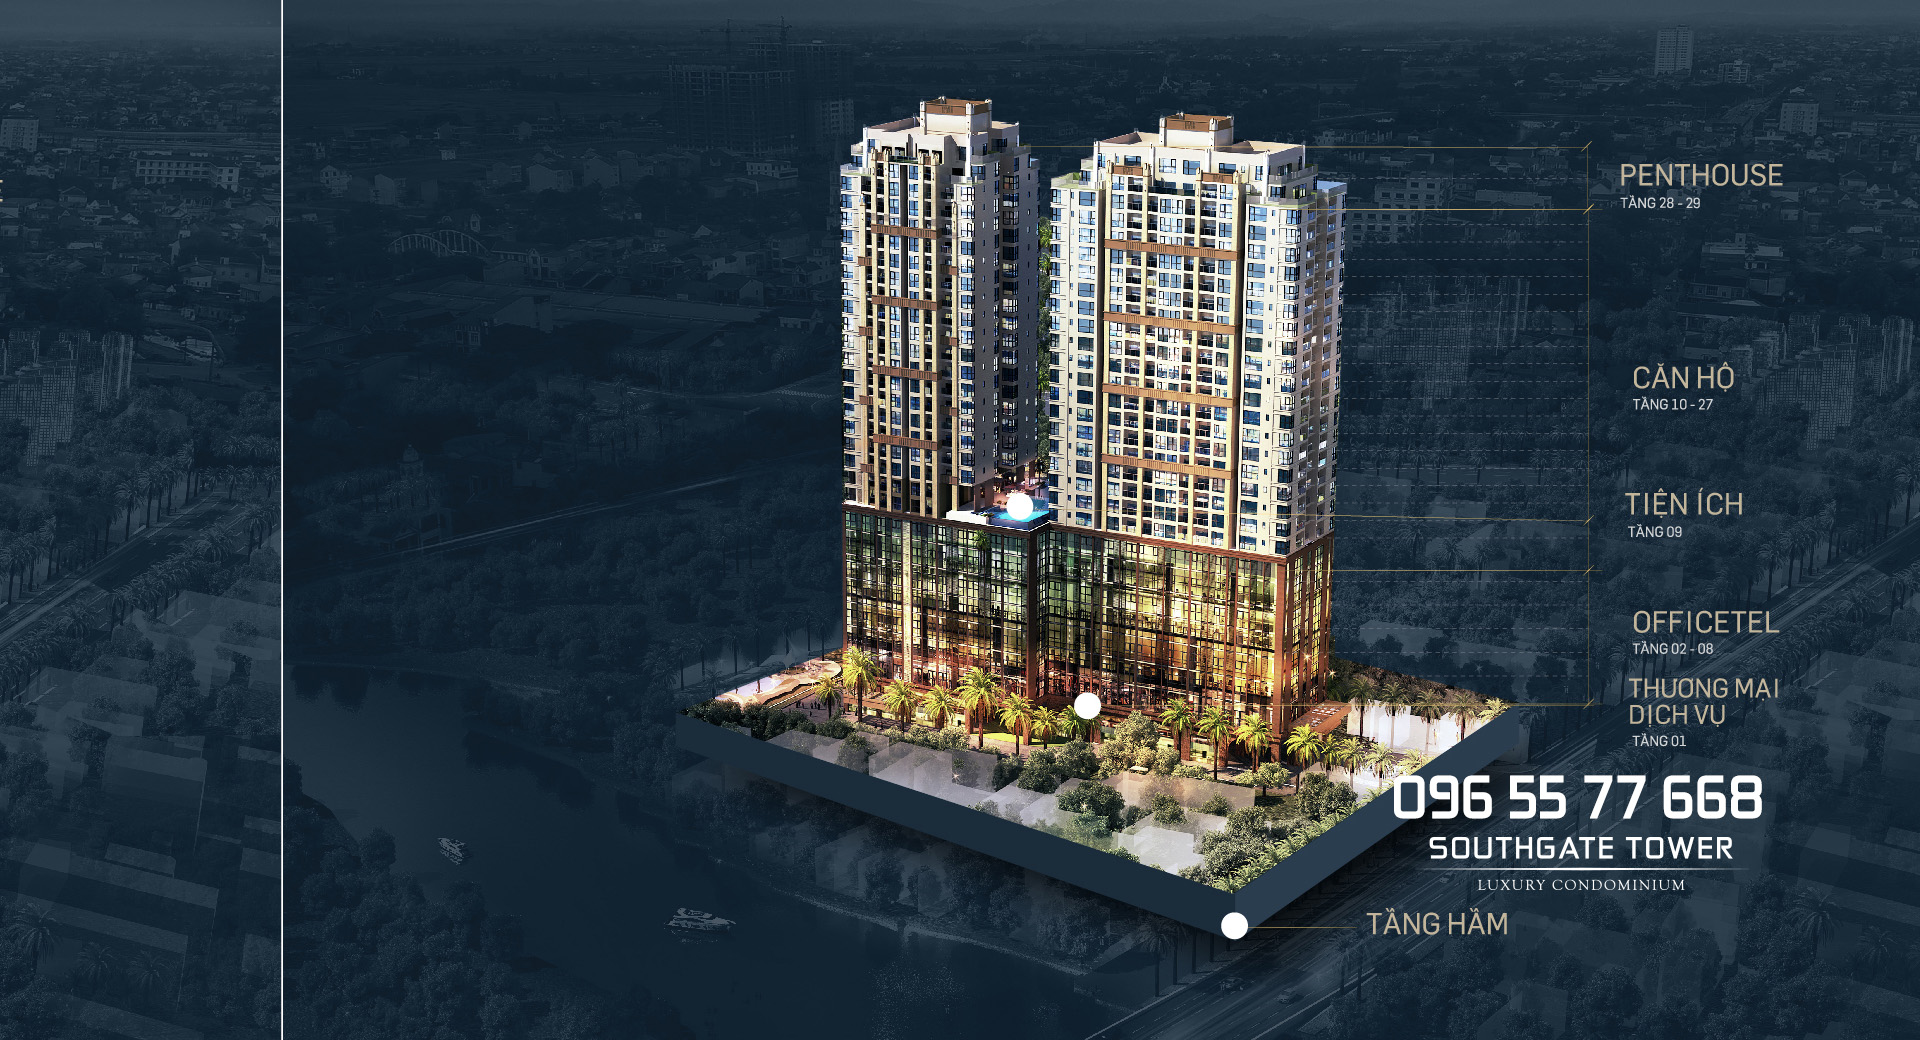 tong-quan-du-an-southgate-tower